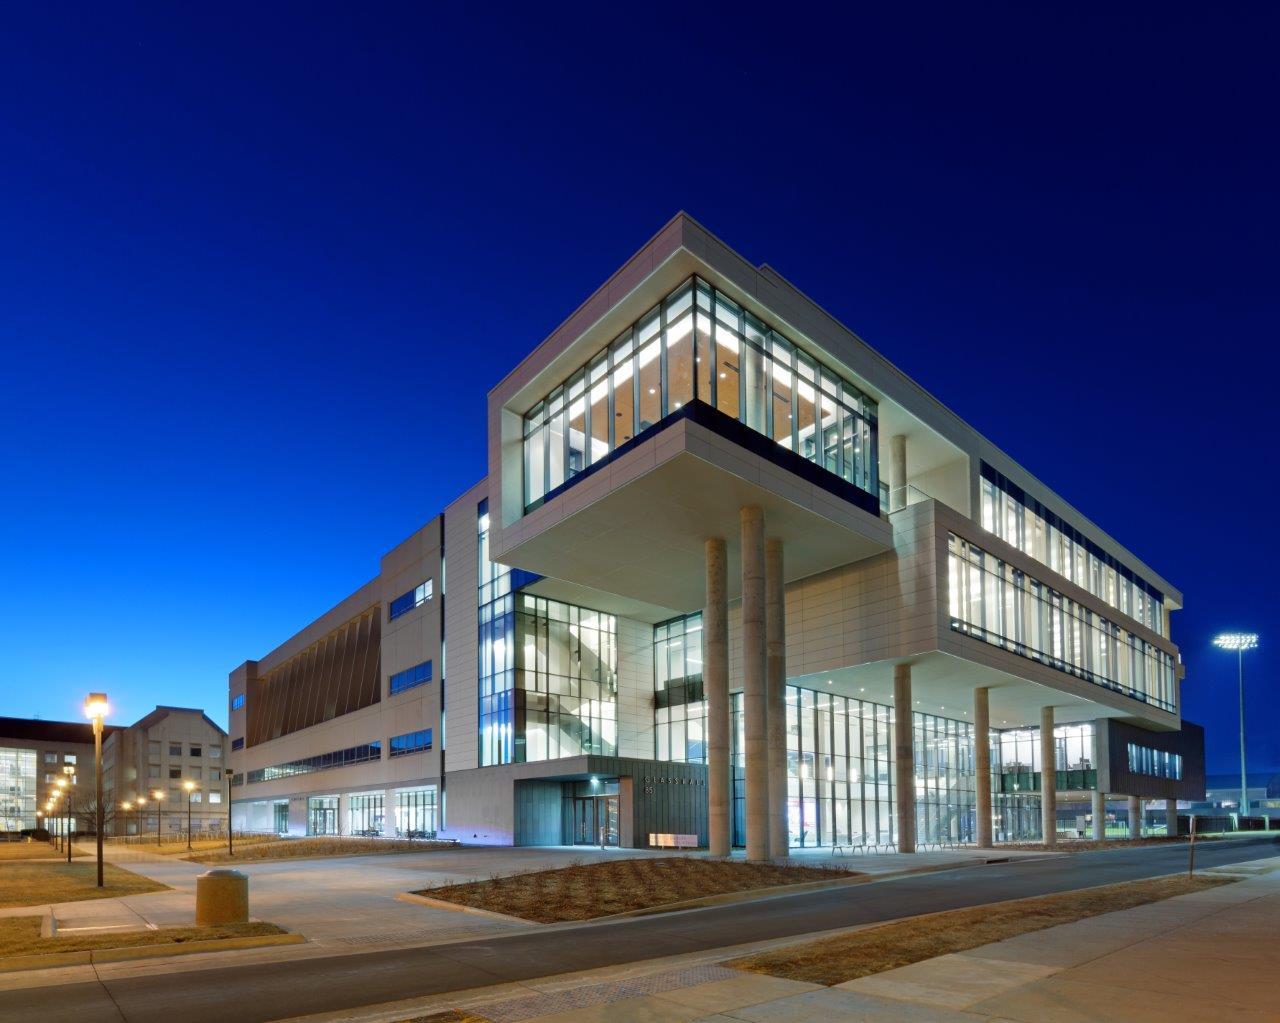 Missouri State University Glass Hall Renovation and Addition